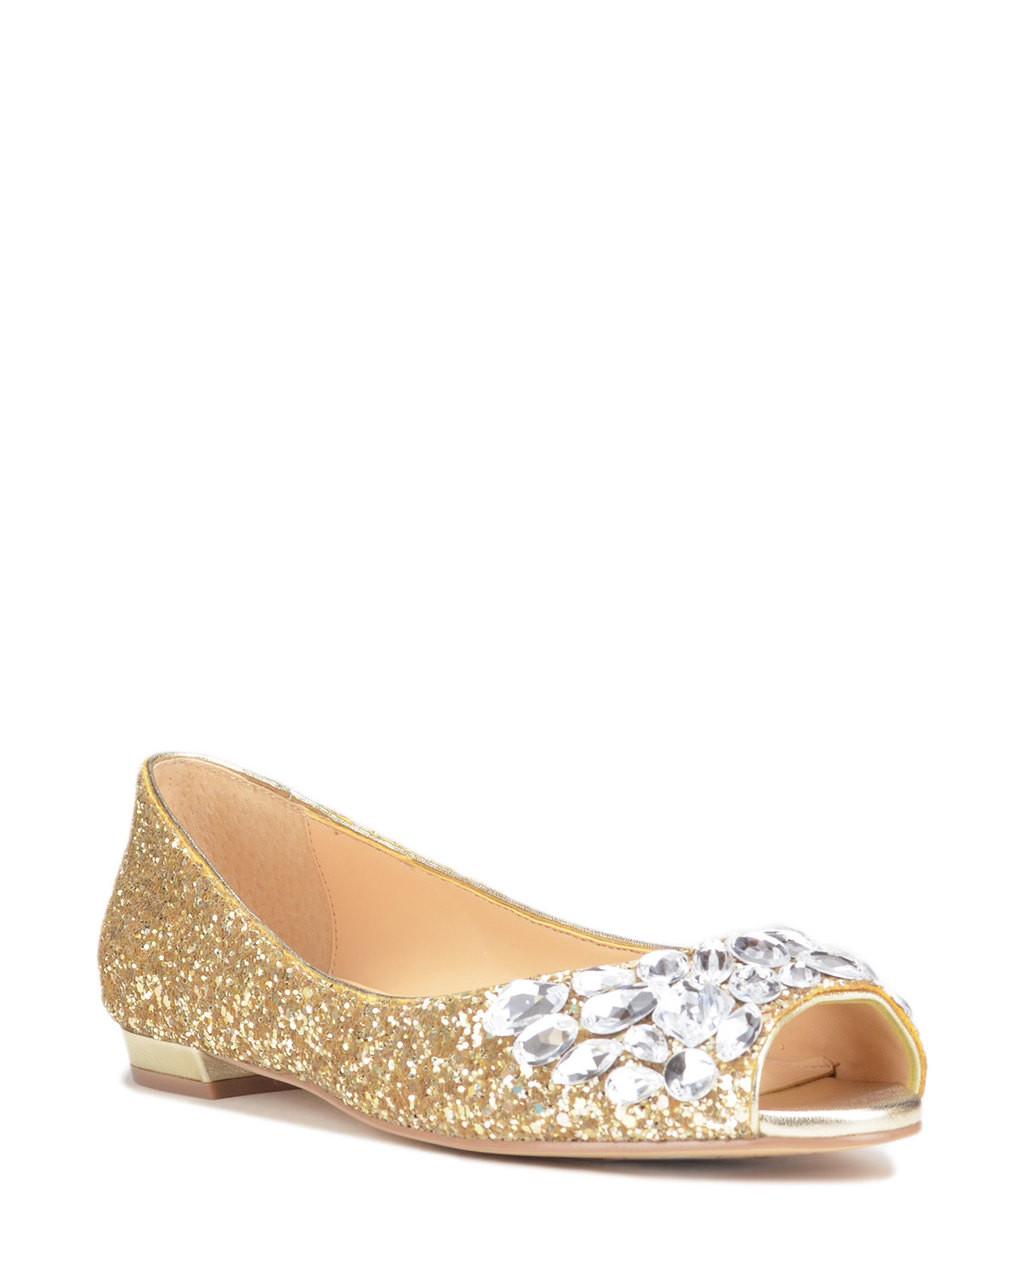 b37786ce9 Claire Metallic Glitter Ballet Flat from Jewel by Badgley Mischka